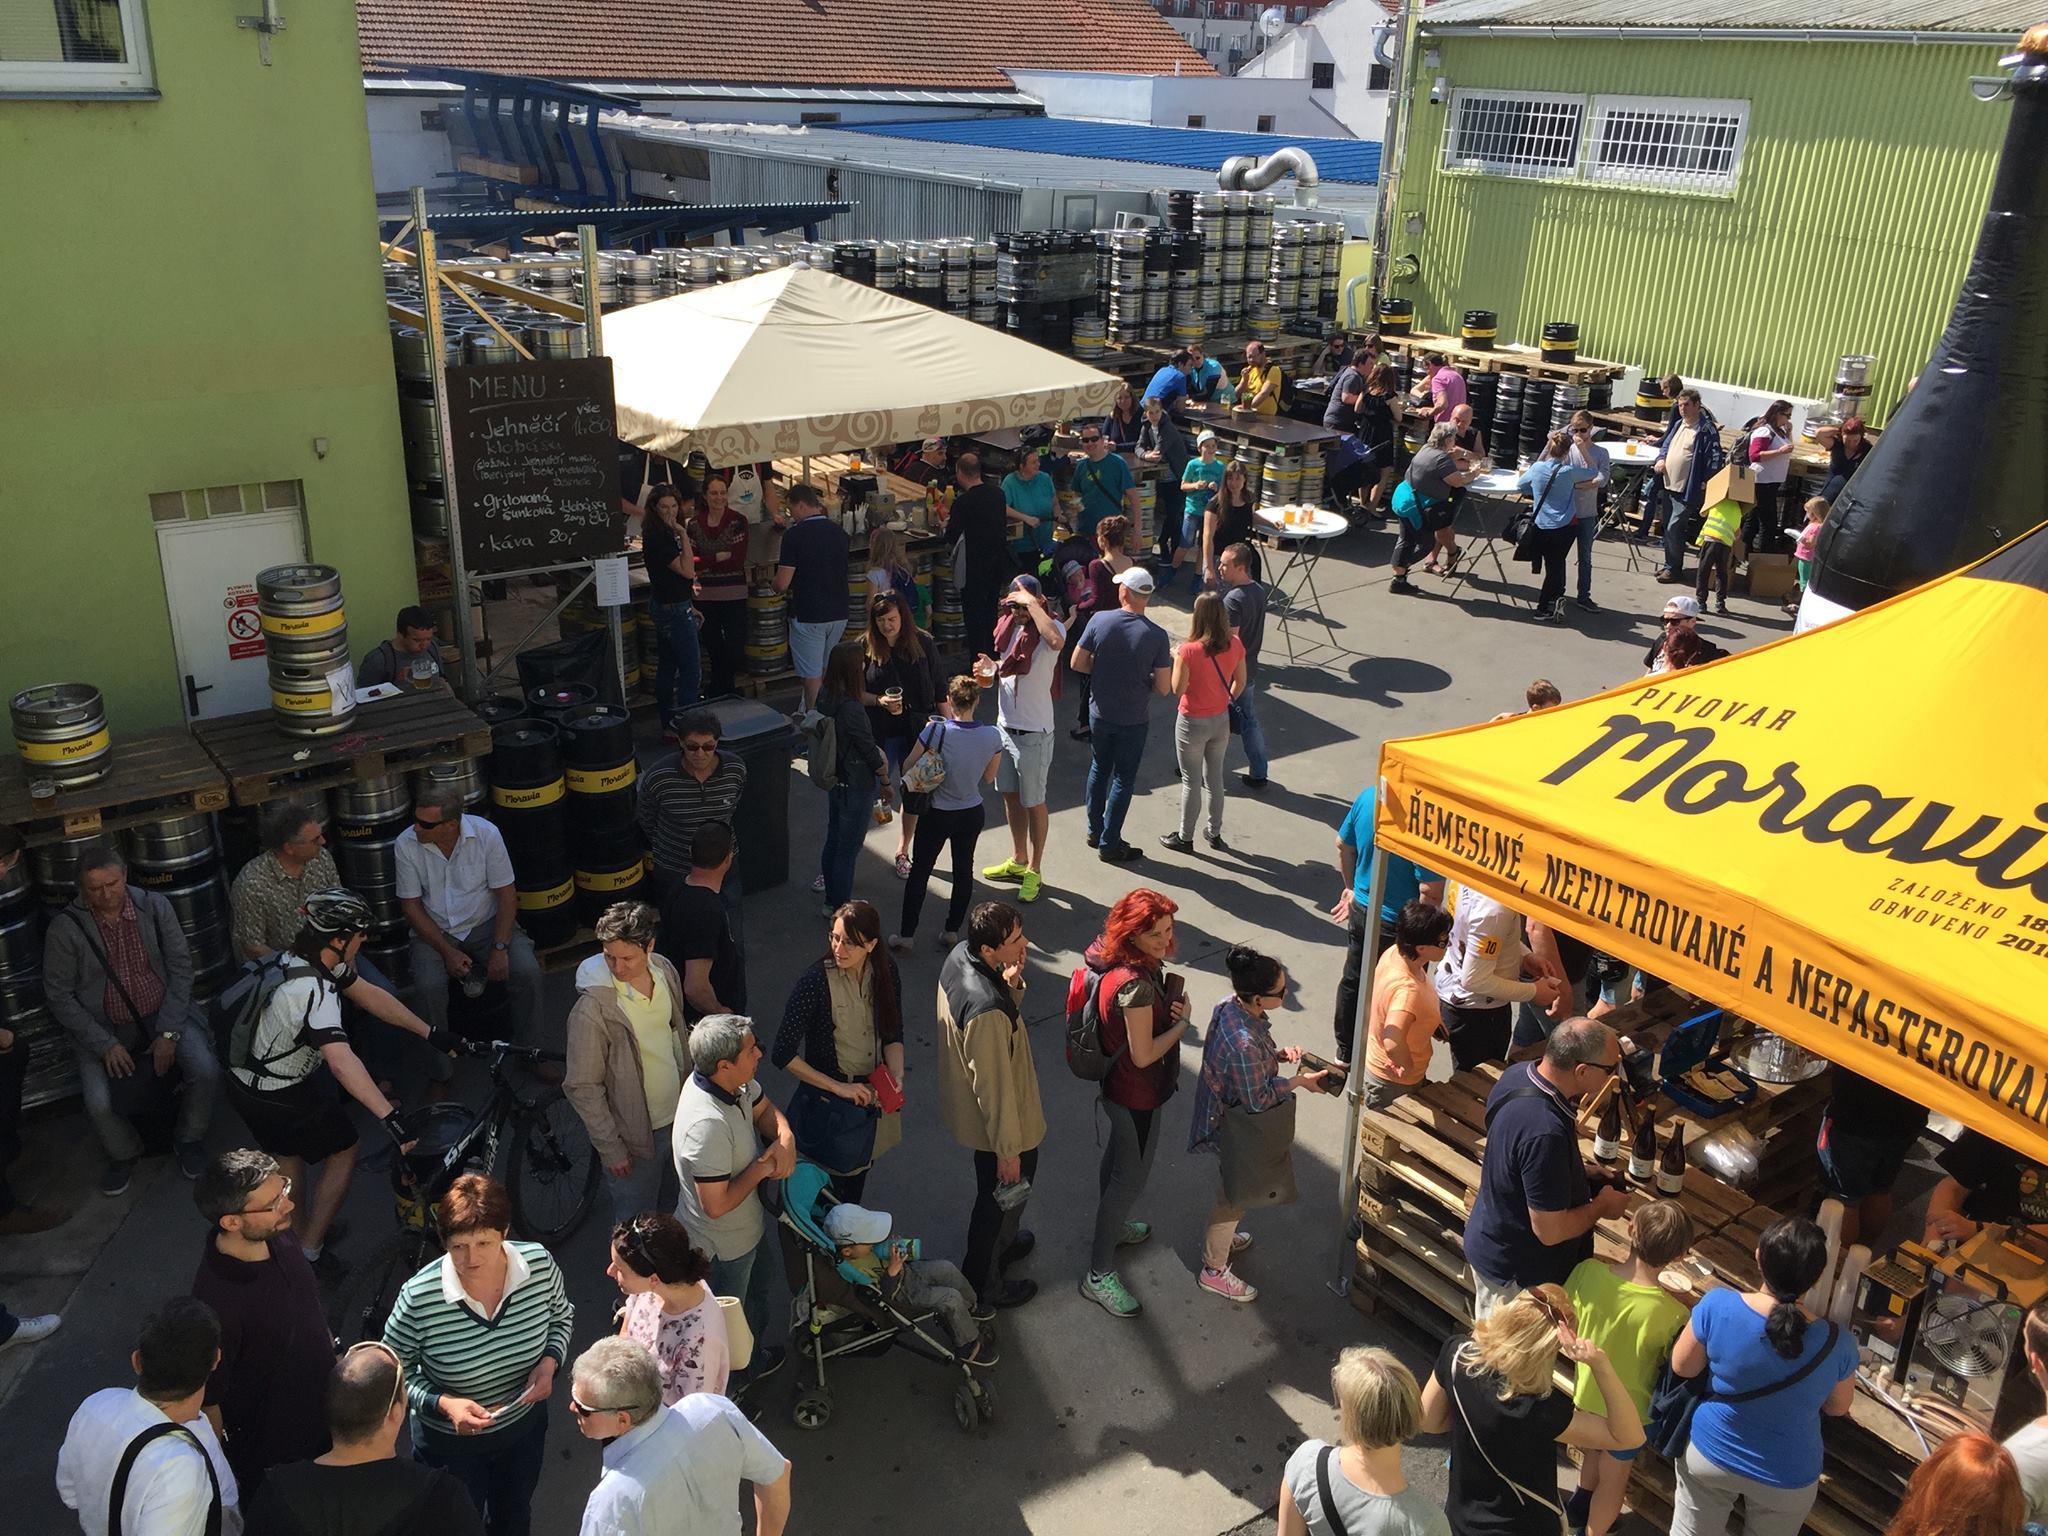 pivovari-pivovary-pivni-akce-mladenecky-pivni-festival-pivovar-moravia-2019